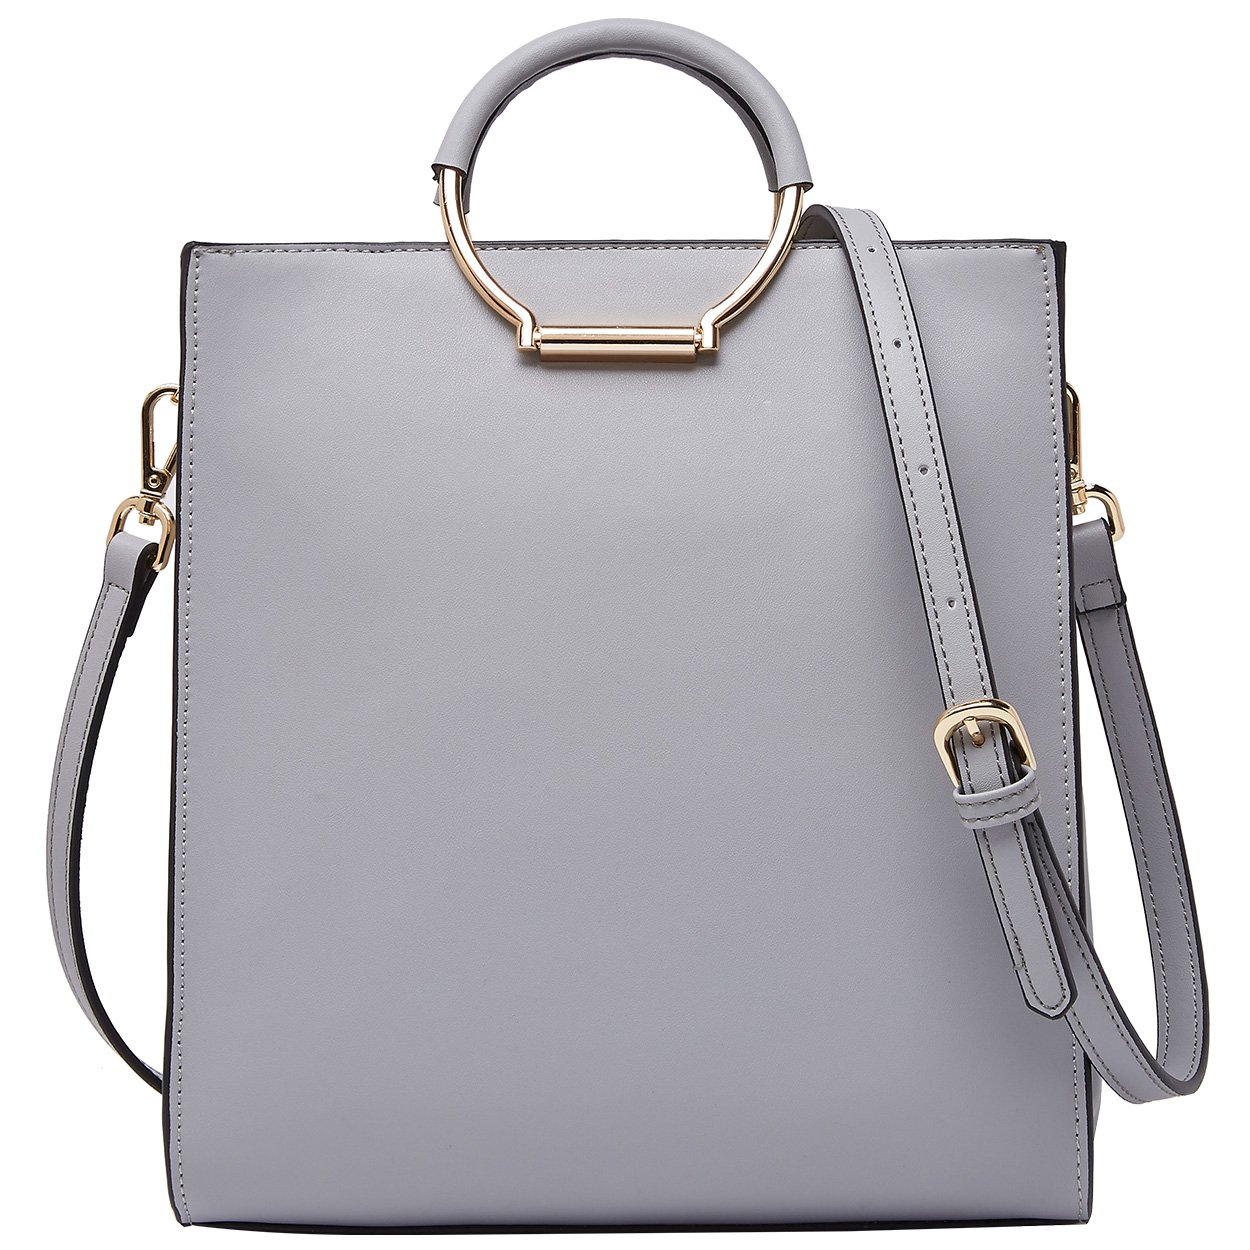 BOYATU Leather Handbags Purse High Capacity Tote Shoulder Crossbodybag for Women(Grey)